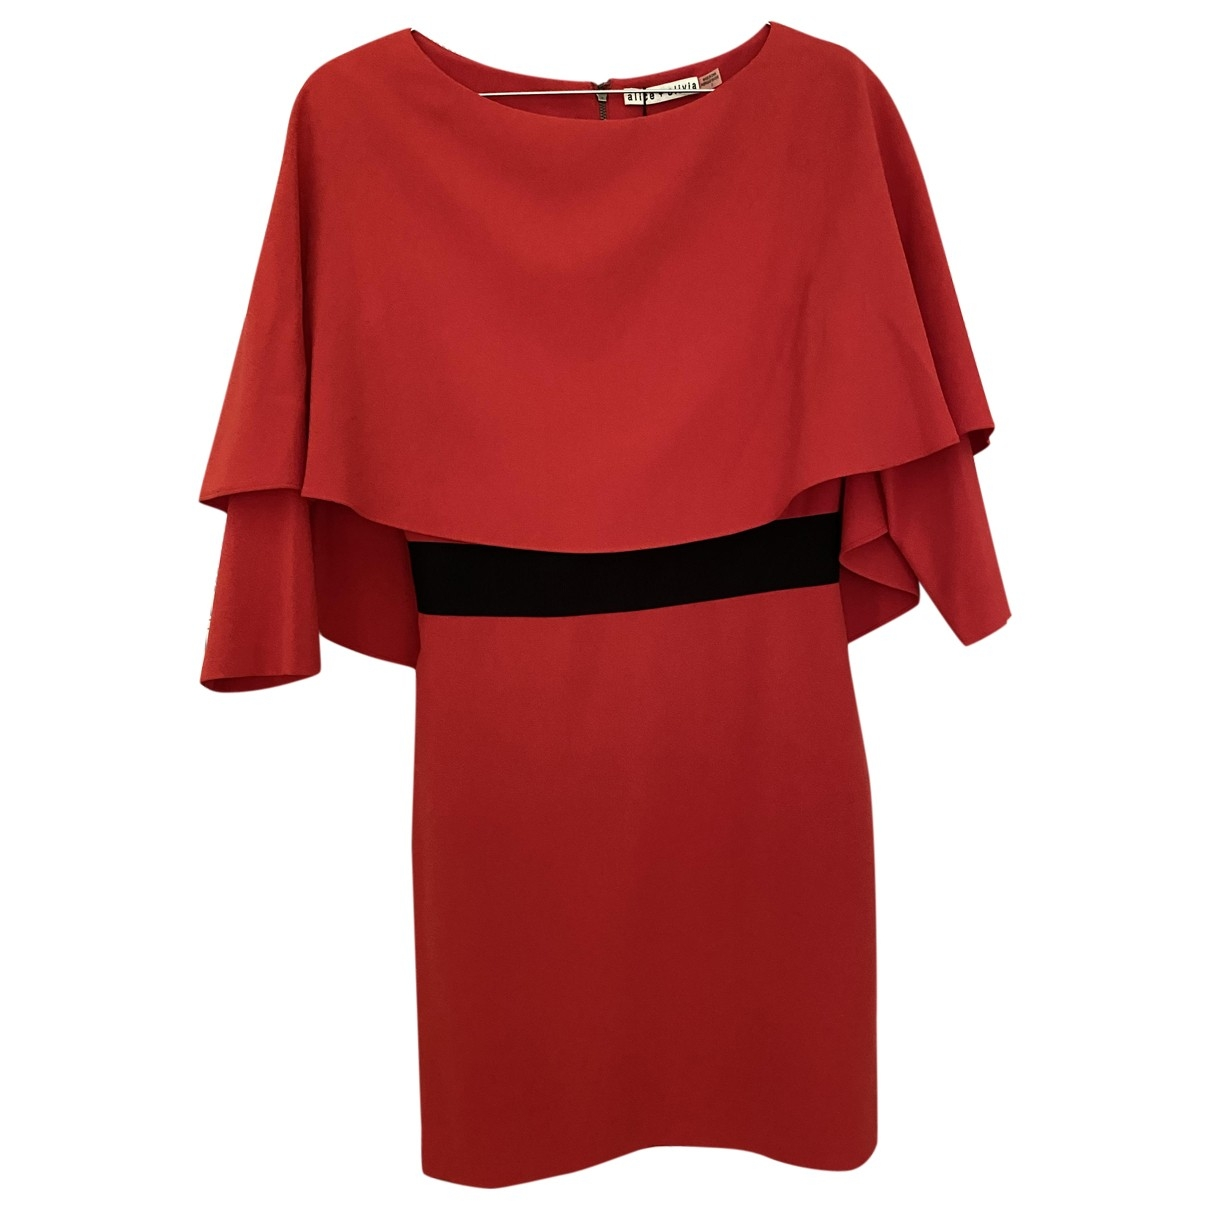 Alice & Olivia \N Kleid in  Rot Polyester